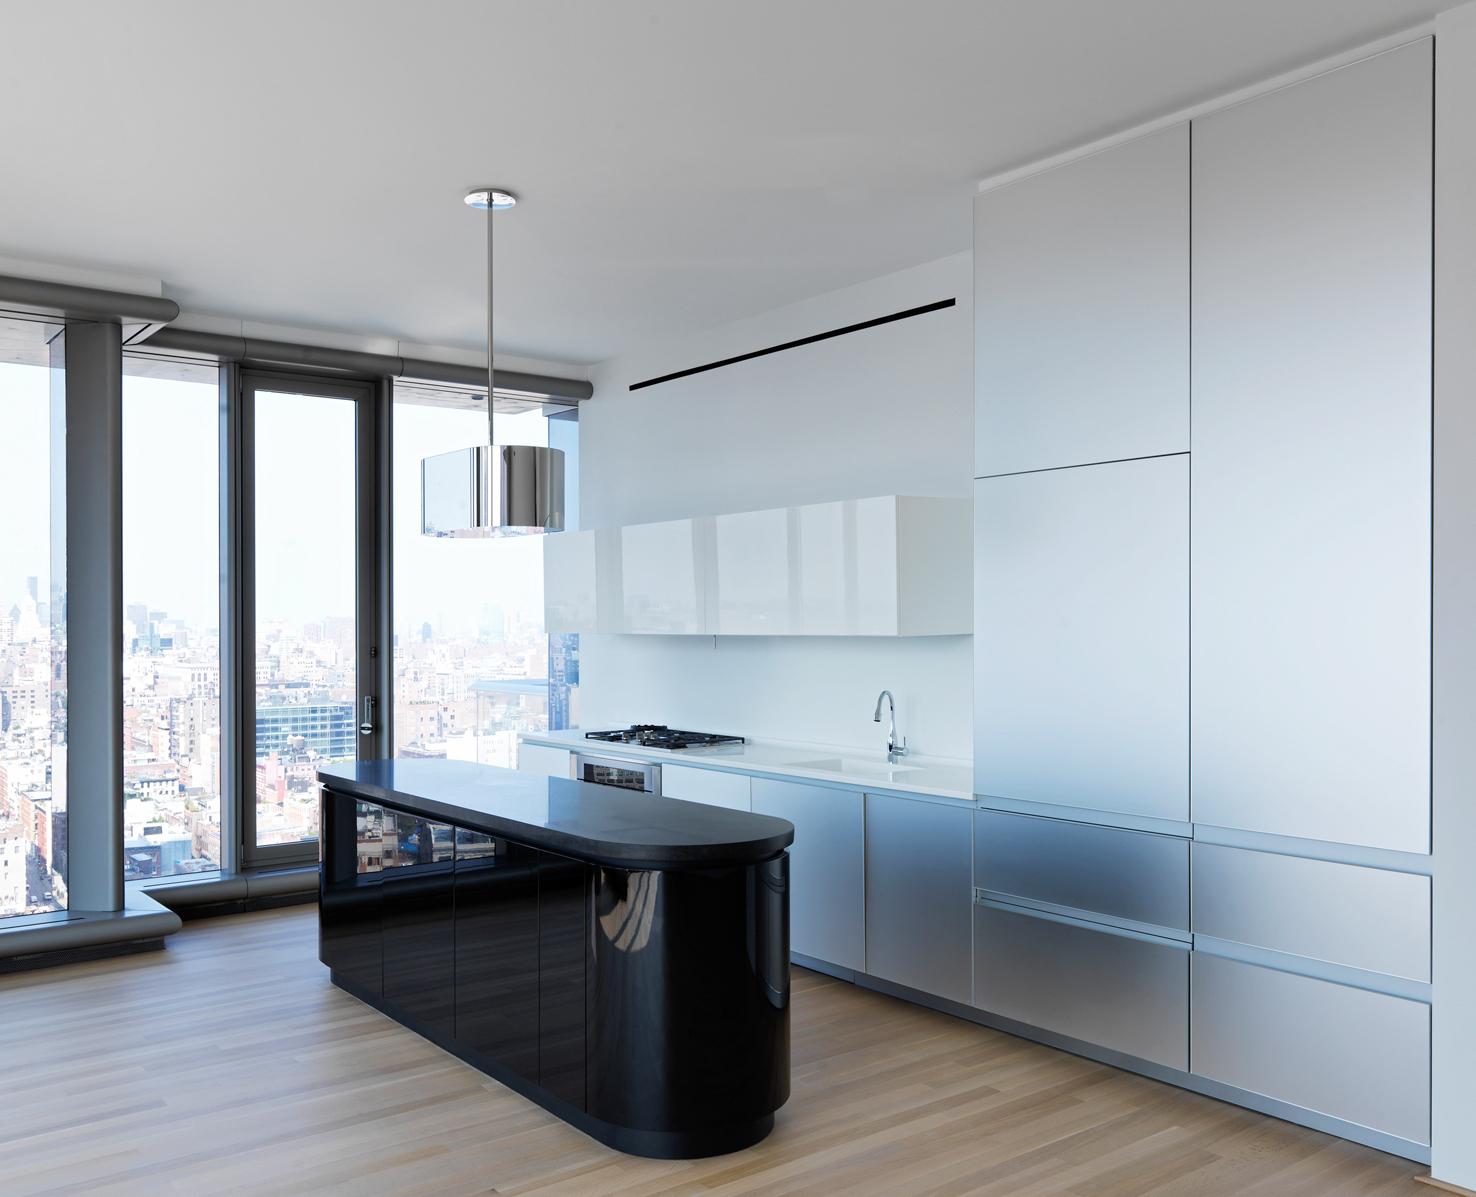 Organic elegance: Dada kitchens and bathrooms at lofty heights ...